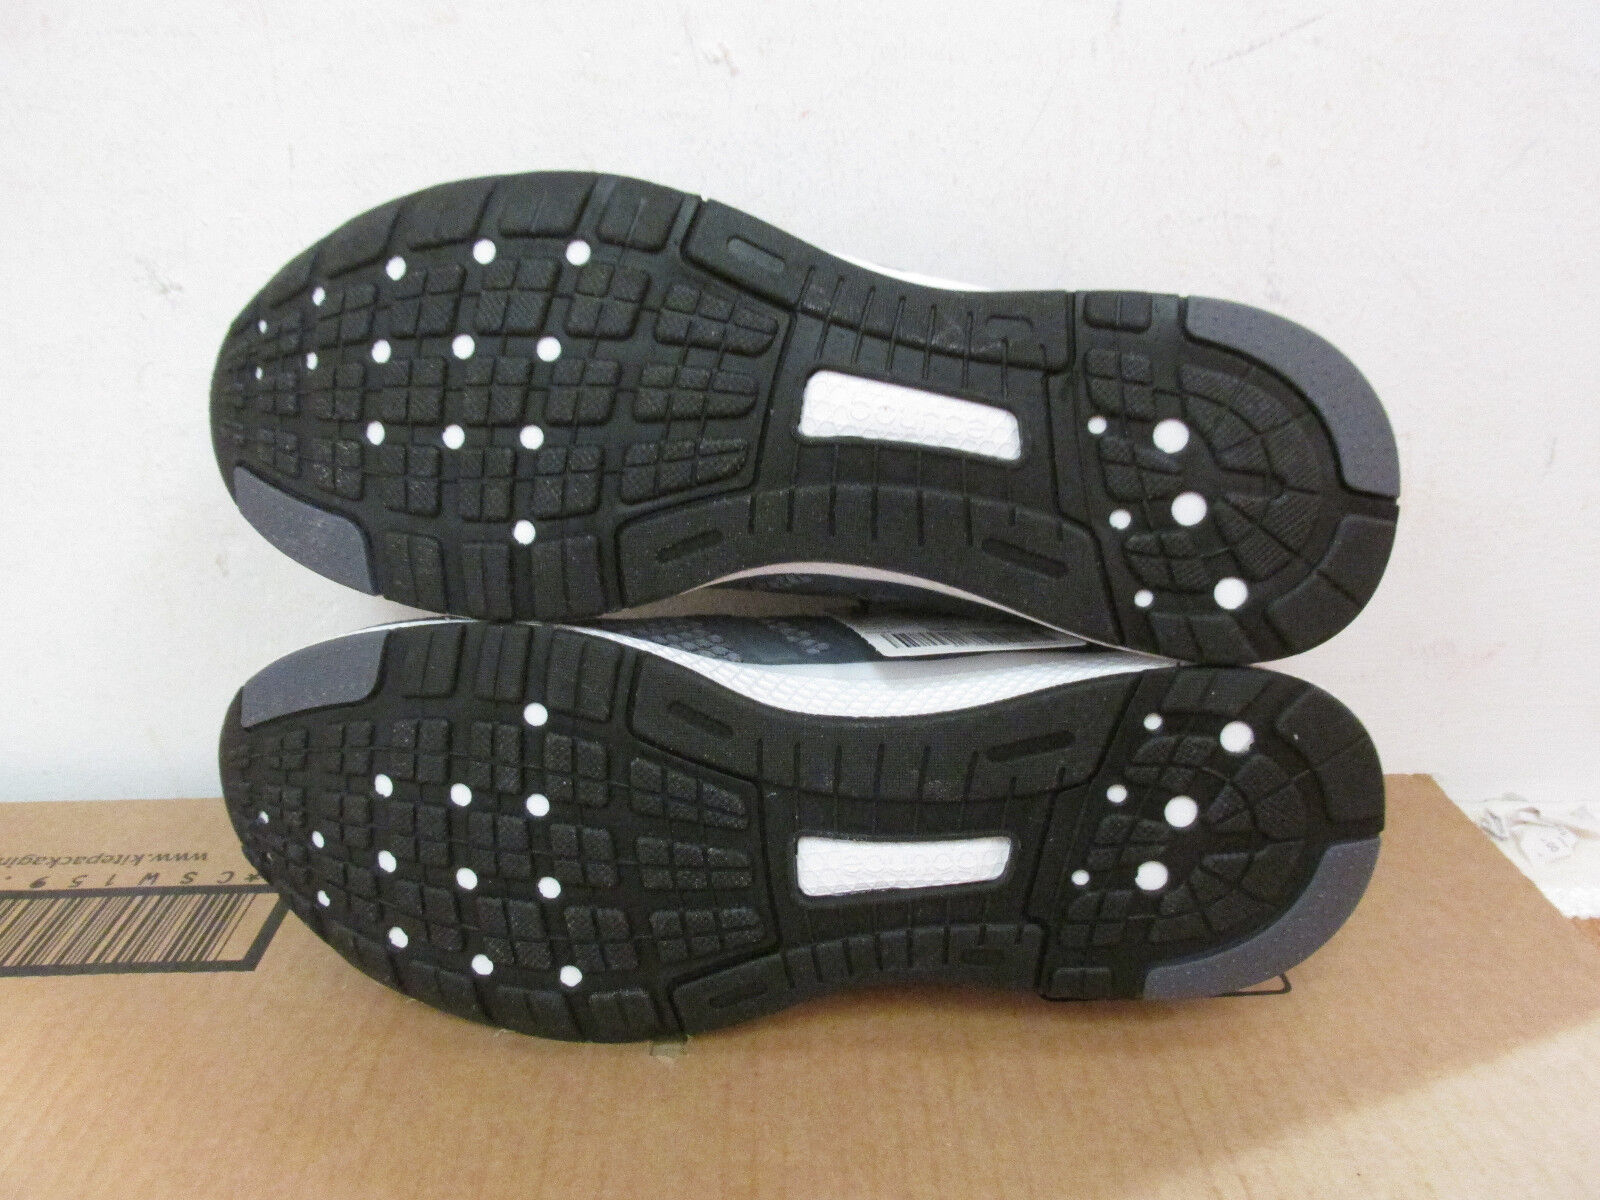 Adidas Turnschuhe Mana Bounce B42432 Herren Turnschuhe Adidas Sneakers Probe 2f8bdb